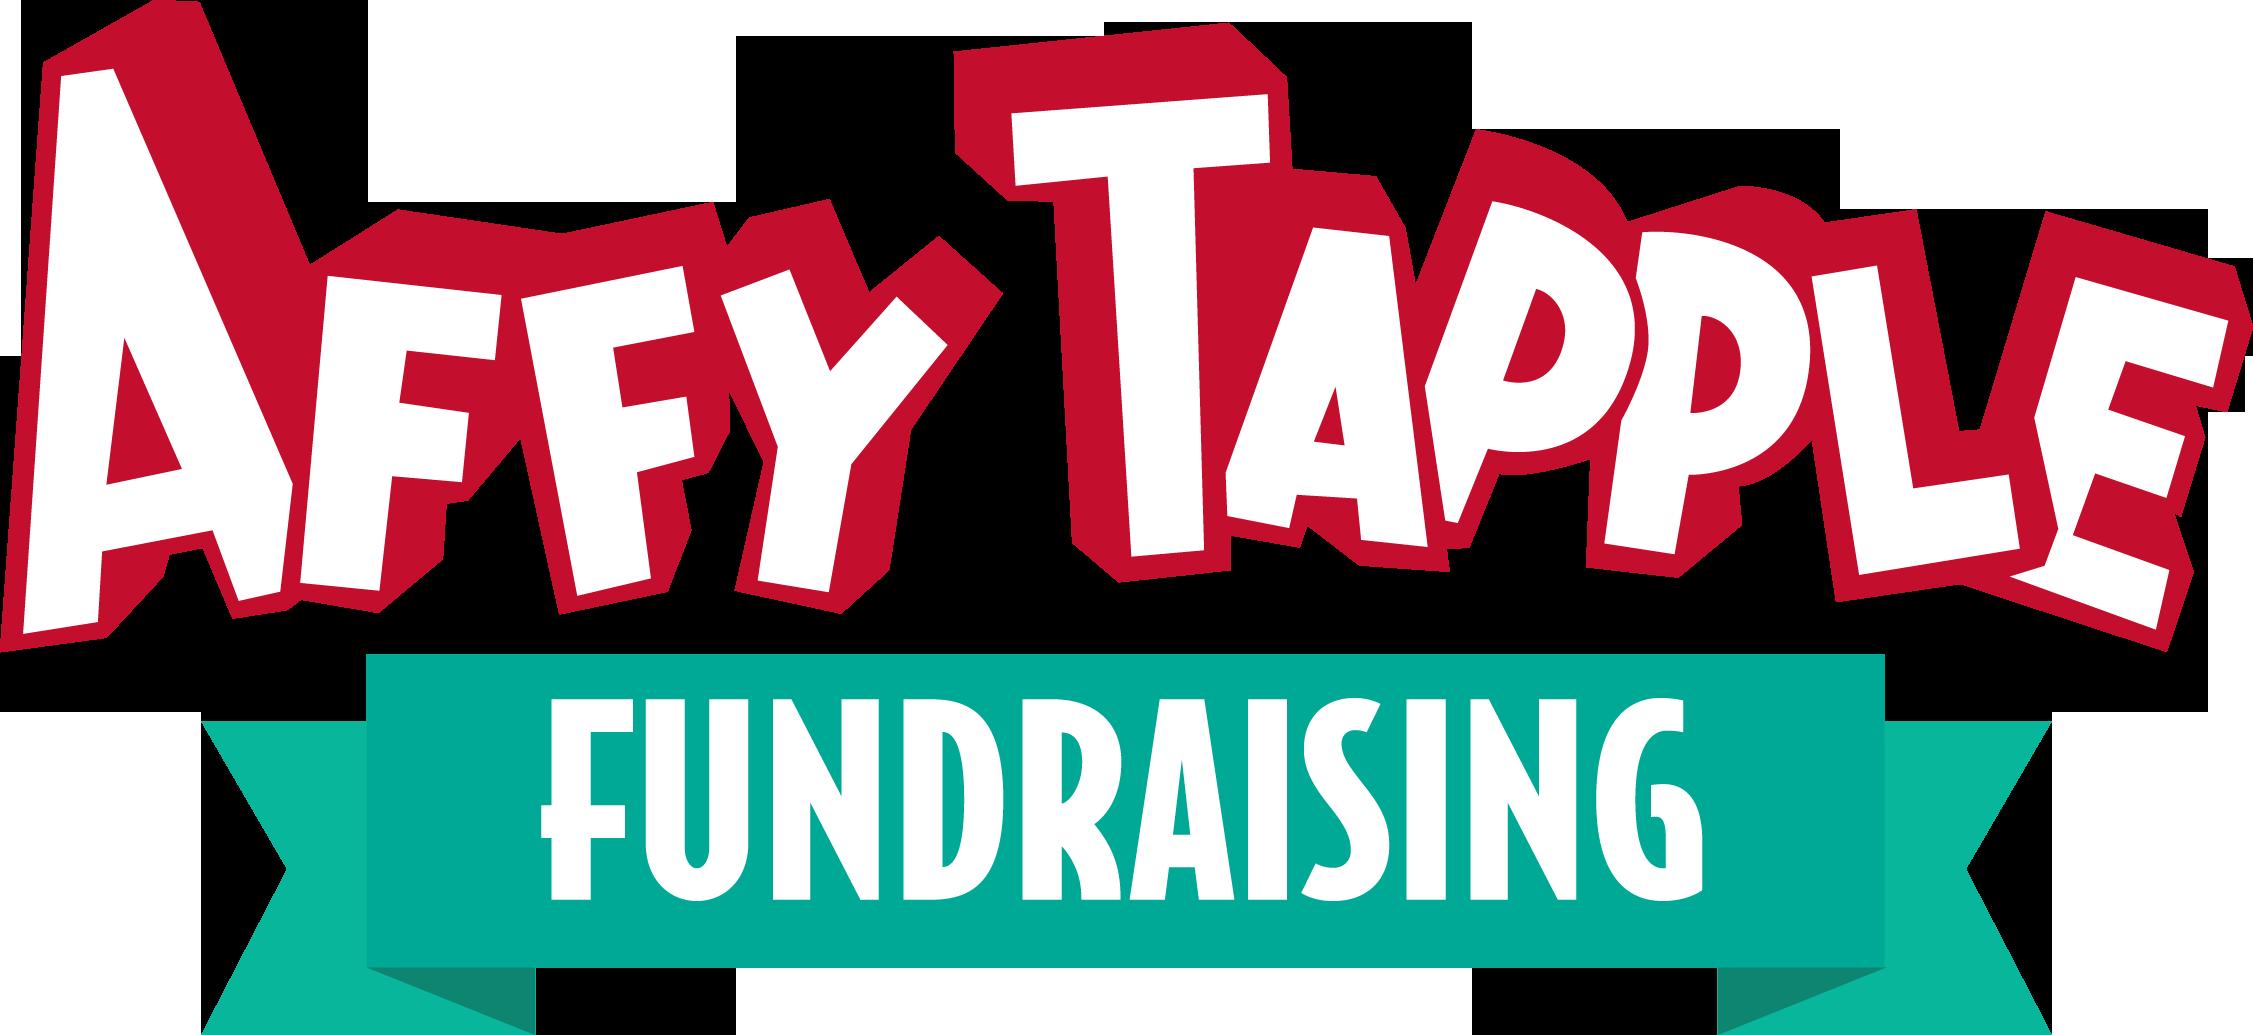 Fundraising - Affy Tapple